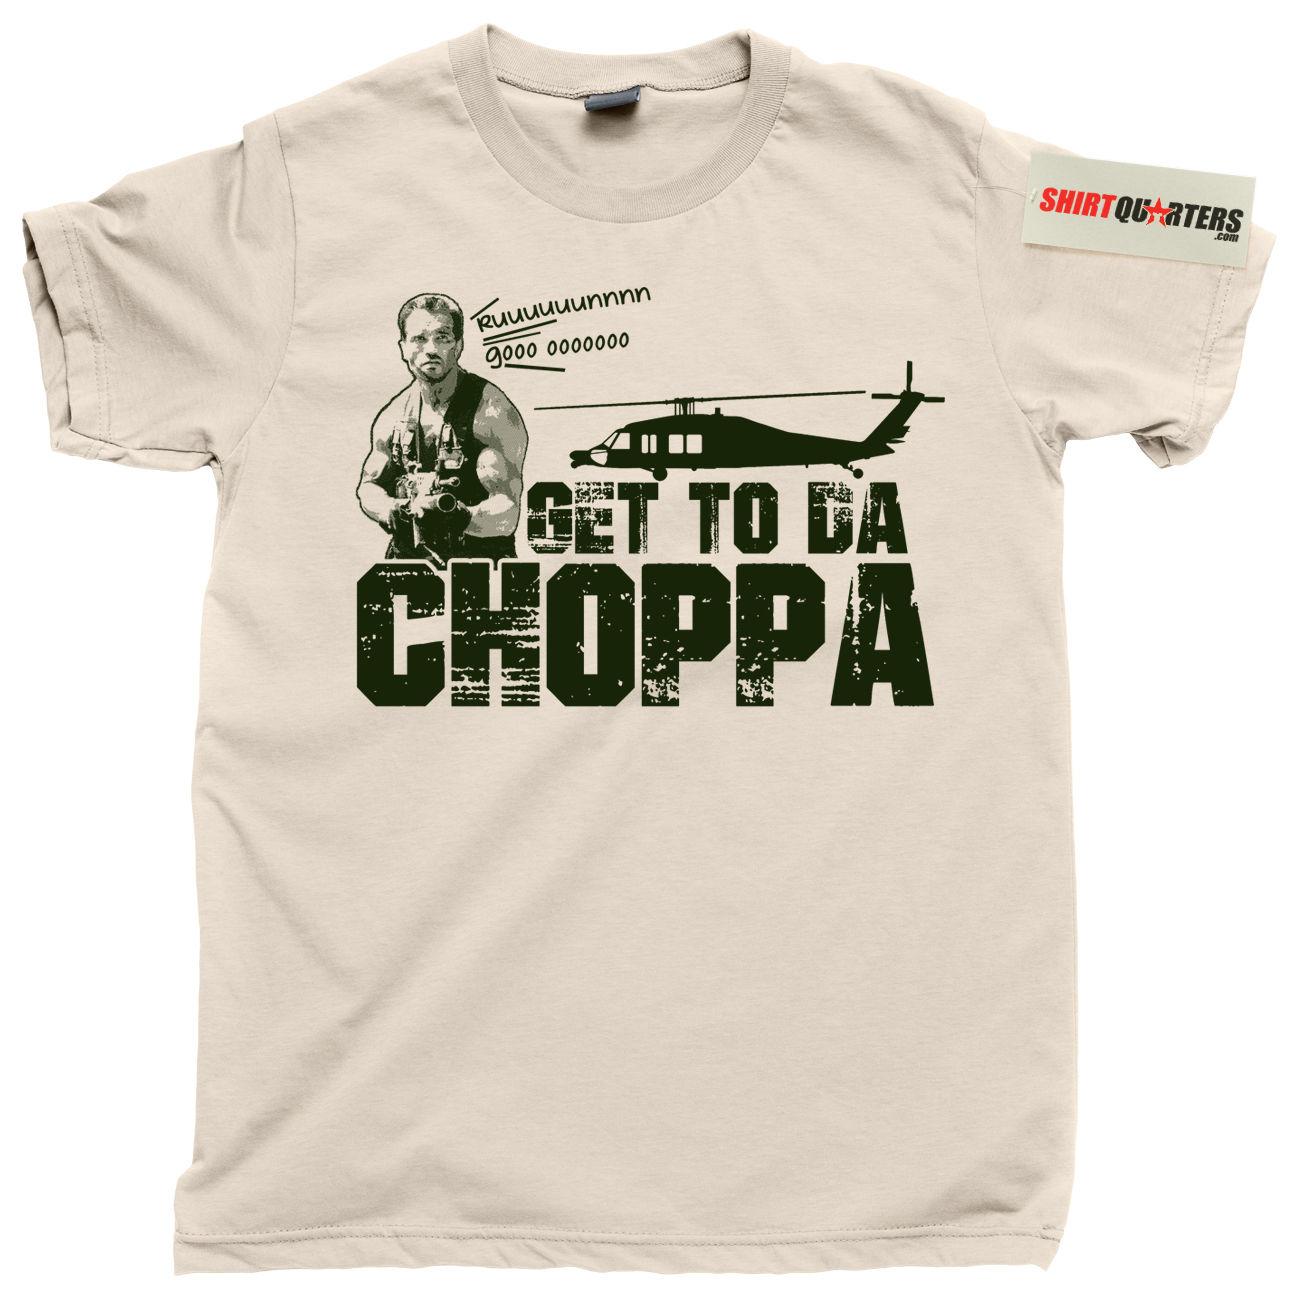 2018 Summer Fashion Hot The Predator 2 3 Arnold Schwarzenegger Get To The Da Choppa Chopper Dvd   T     Shirt   Tee   Shirt